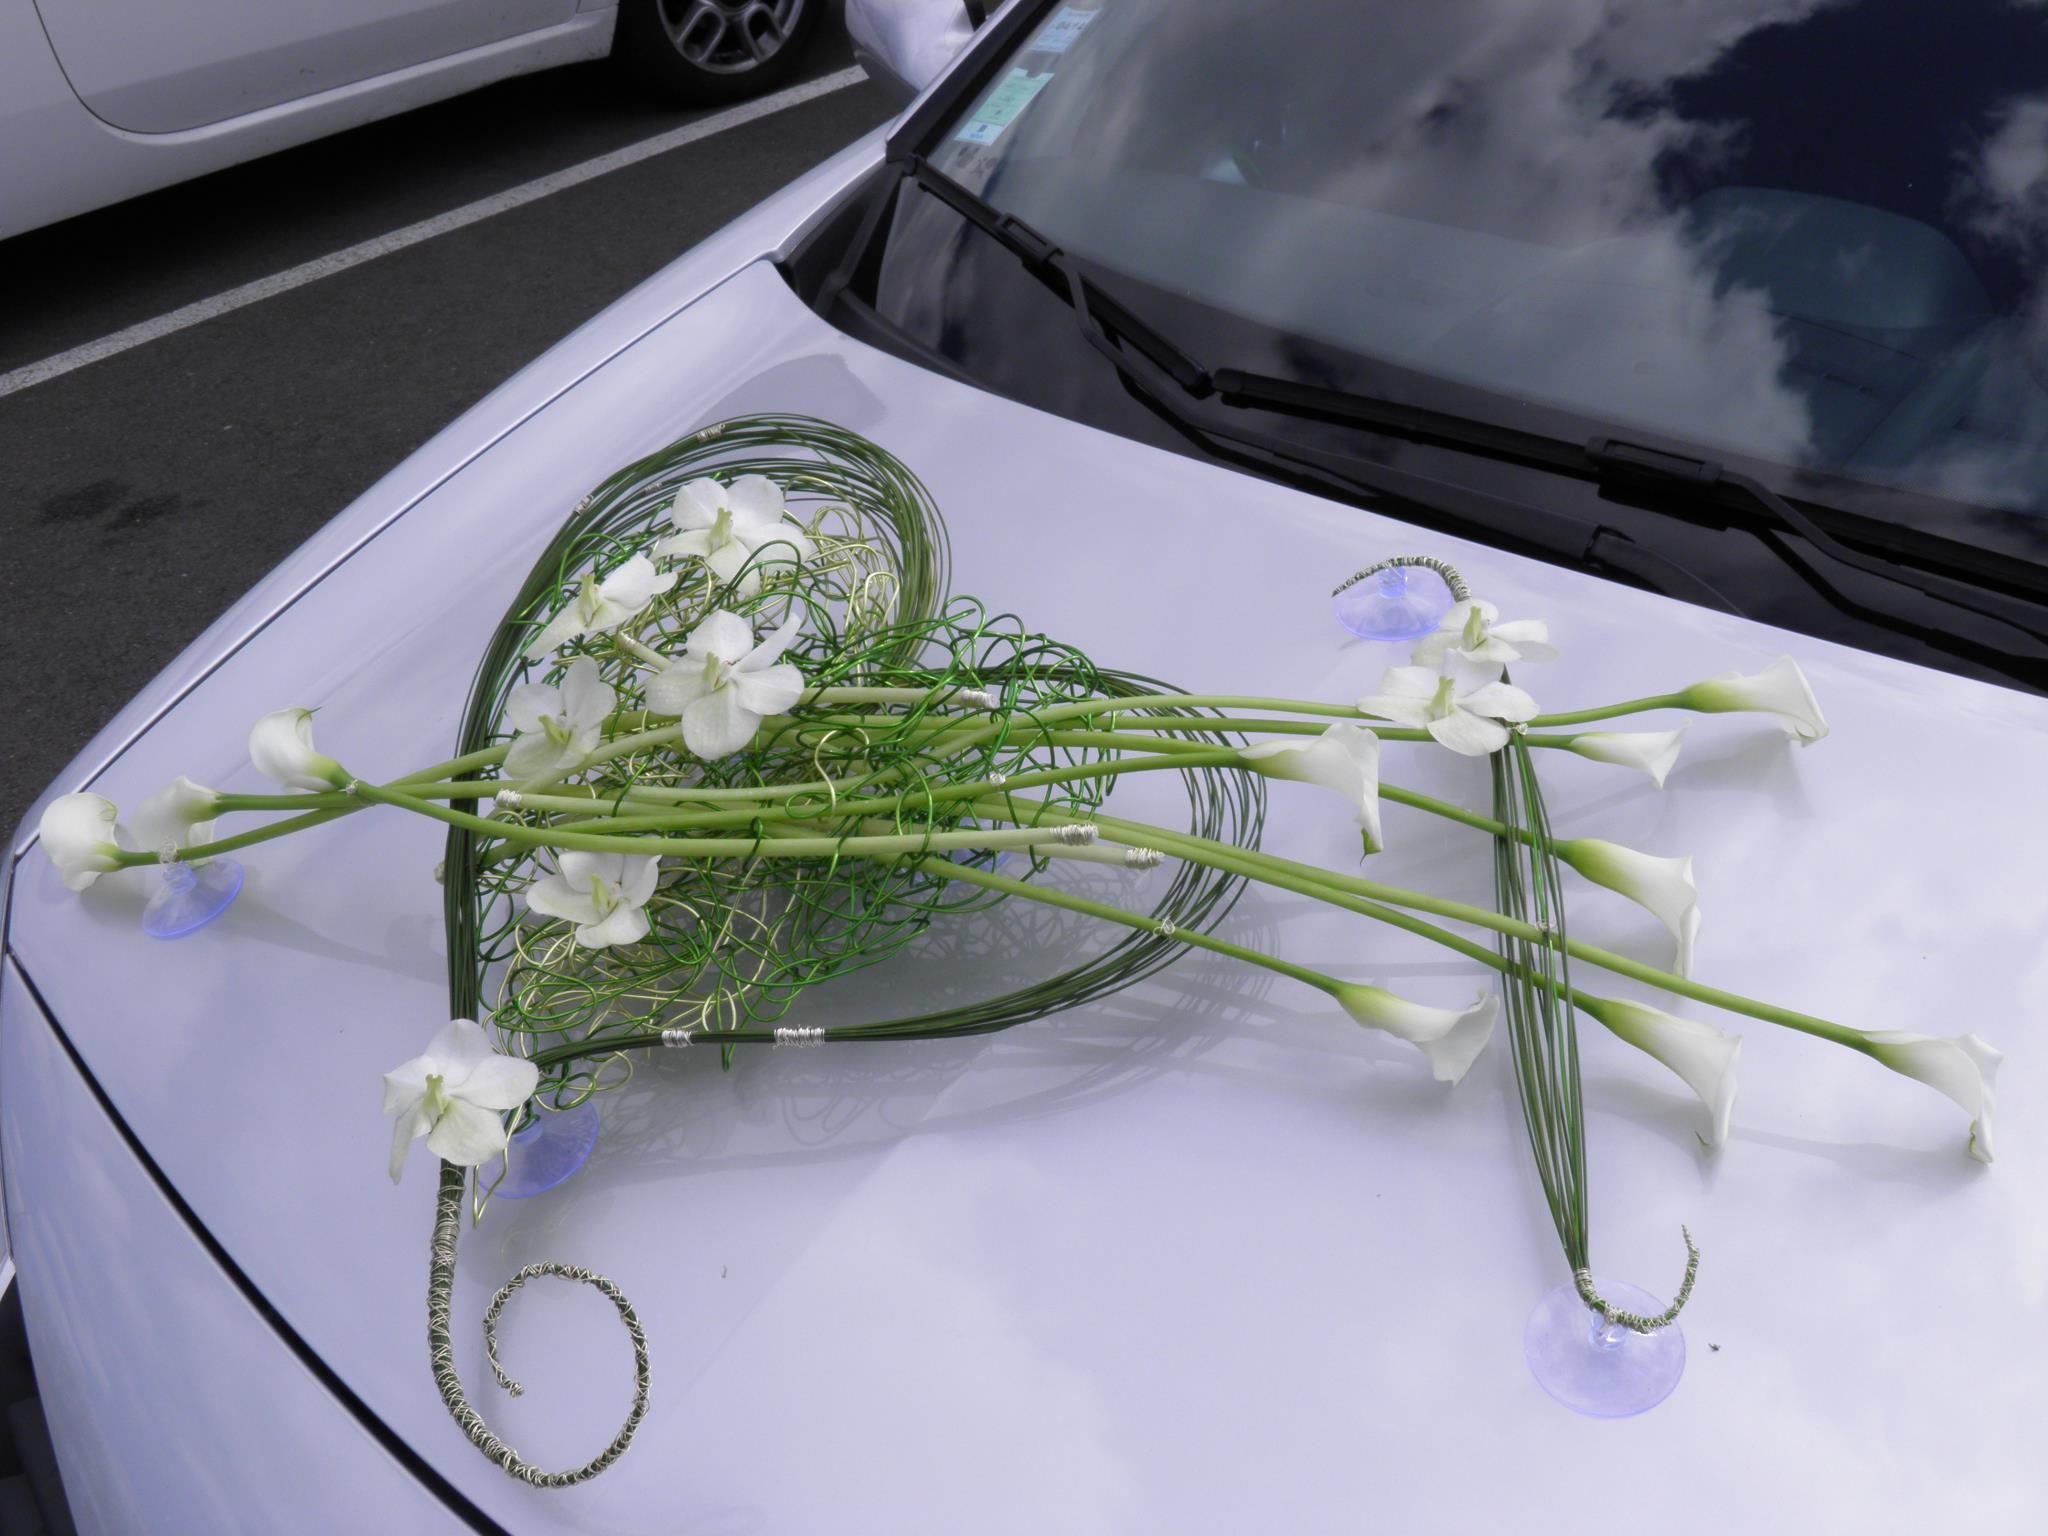 Wedding car flower decoration images  Car decoration  source unknown  Blommor  Pinterest  Wedding cars